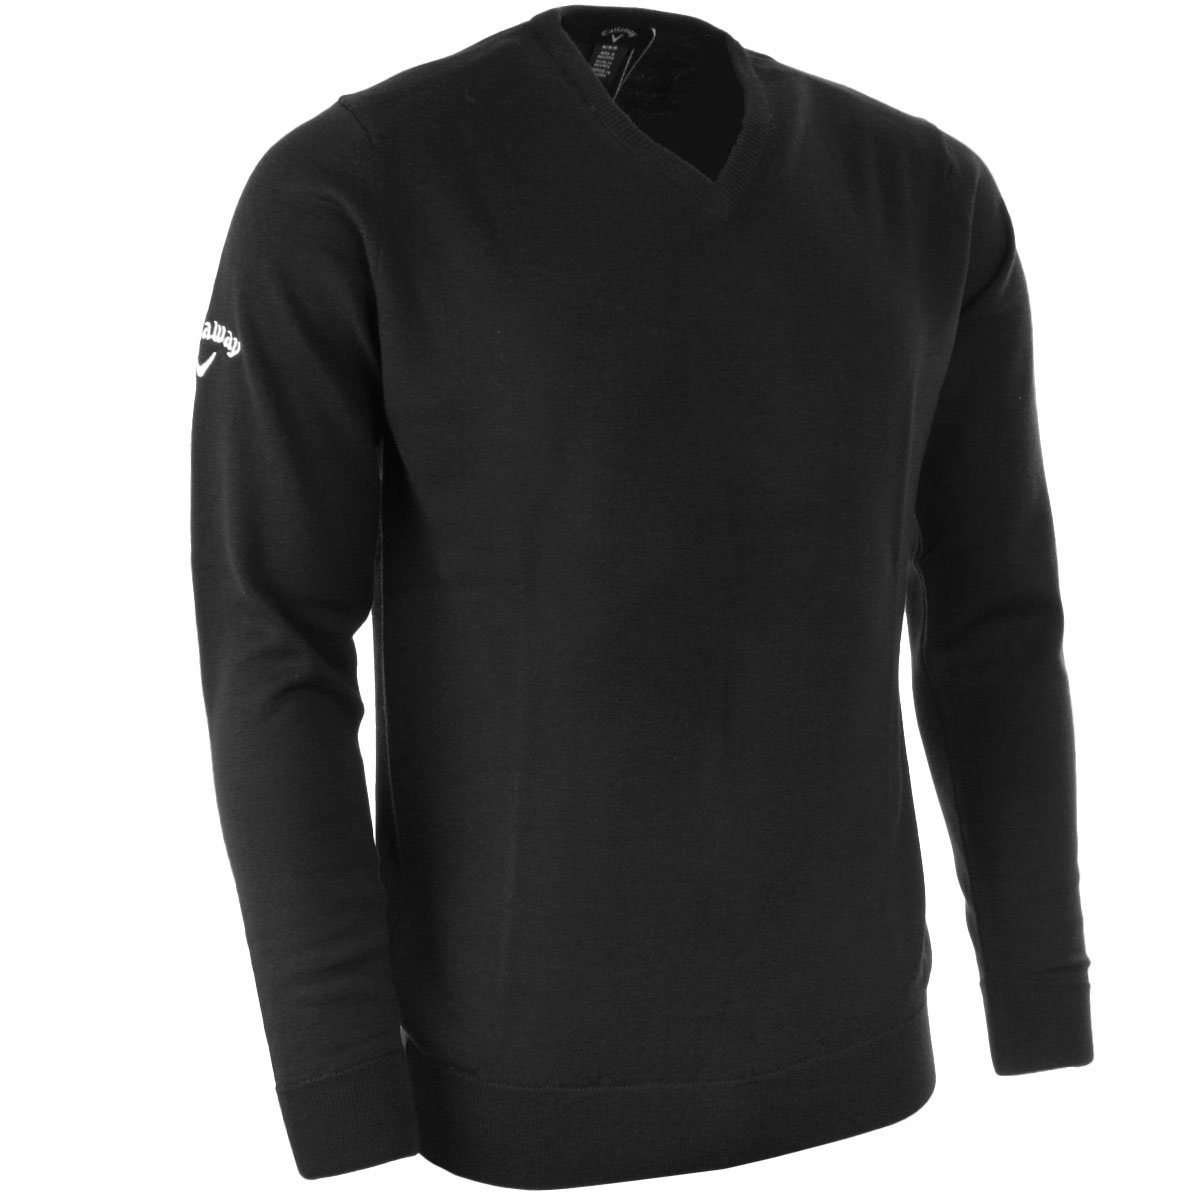 Callaway Golf Merino High v-neck Sweater Jersey, Herren